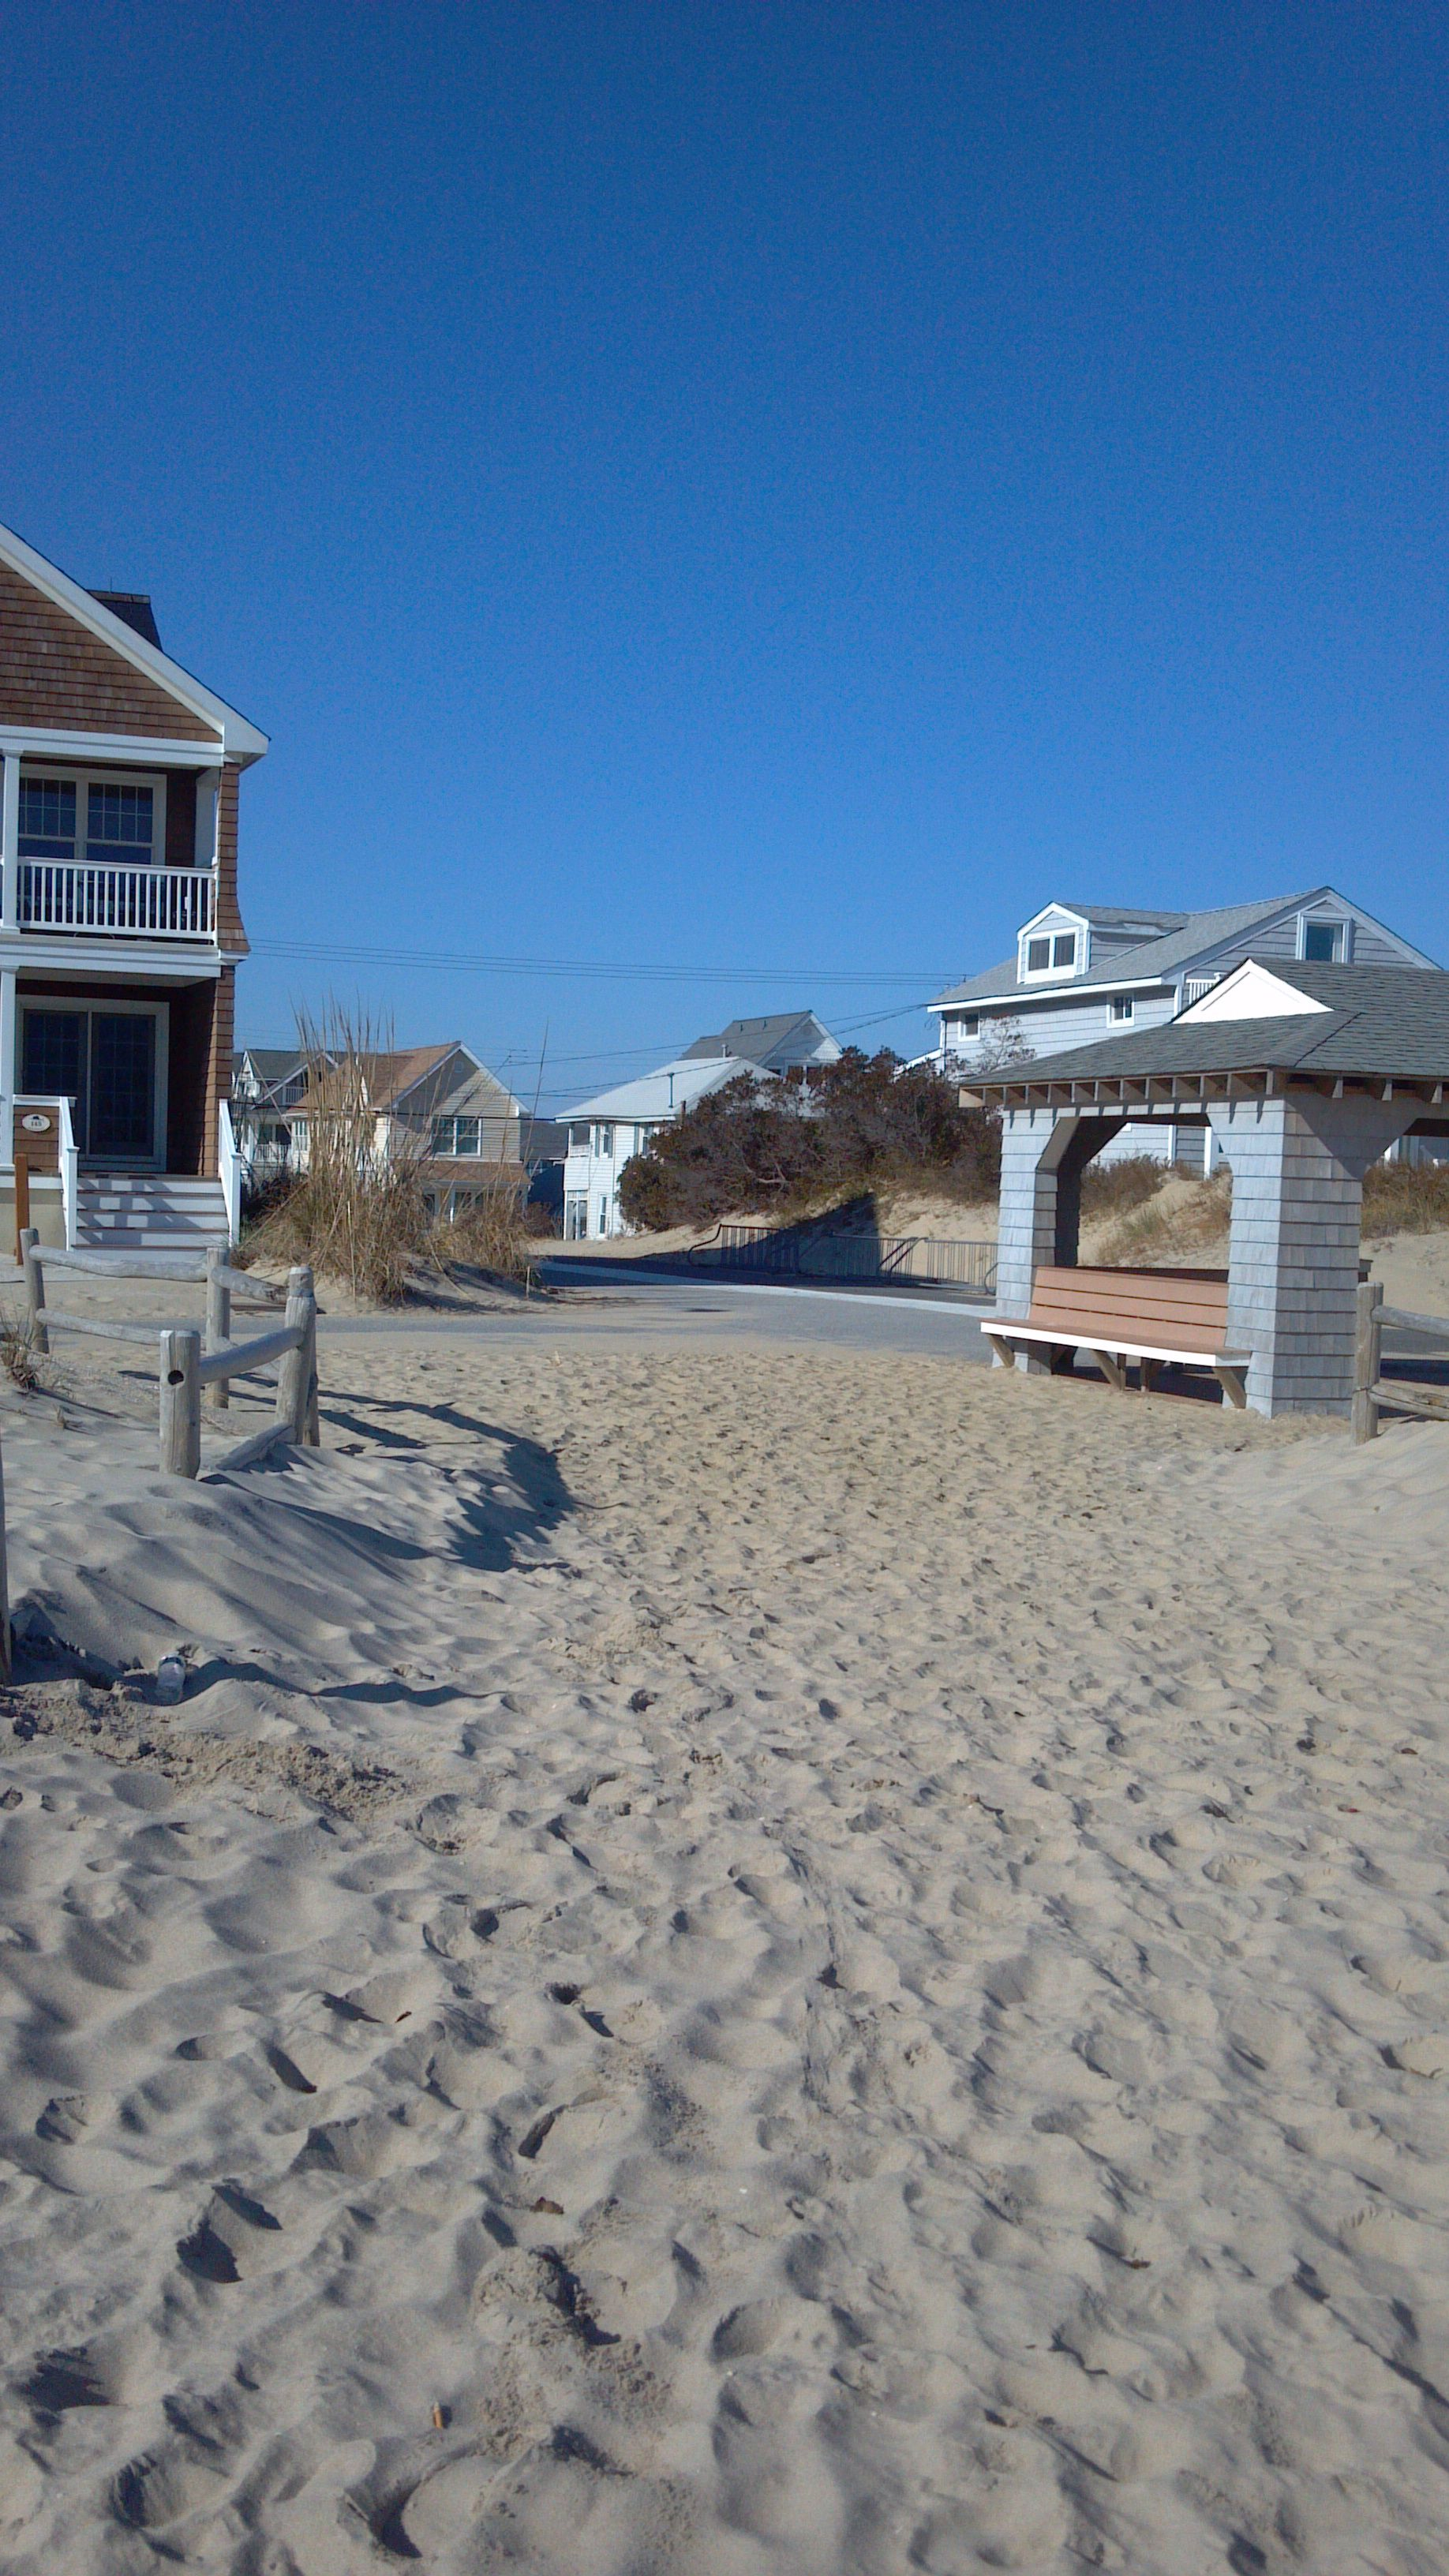 Manasquan Nobeltec New Website Www Nobeltec Com Coast Seaside Beach Seaside Towns Jersey Shore Pool Houses